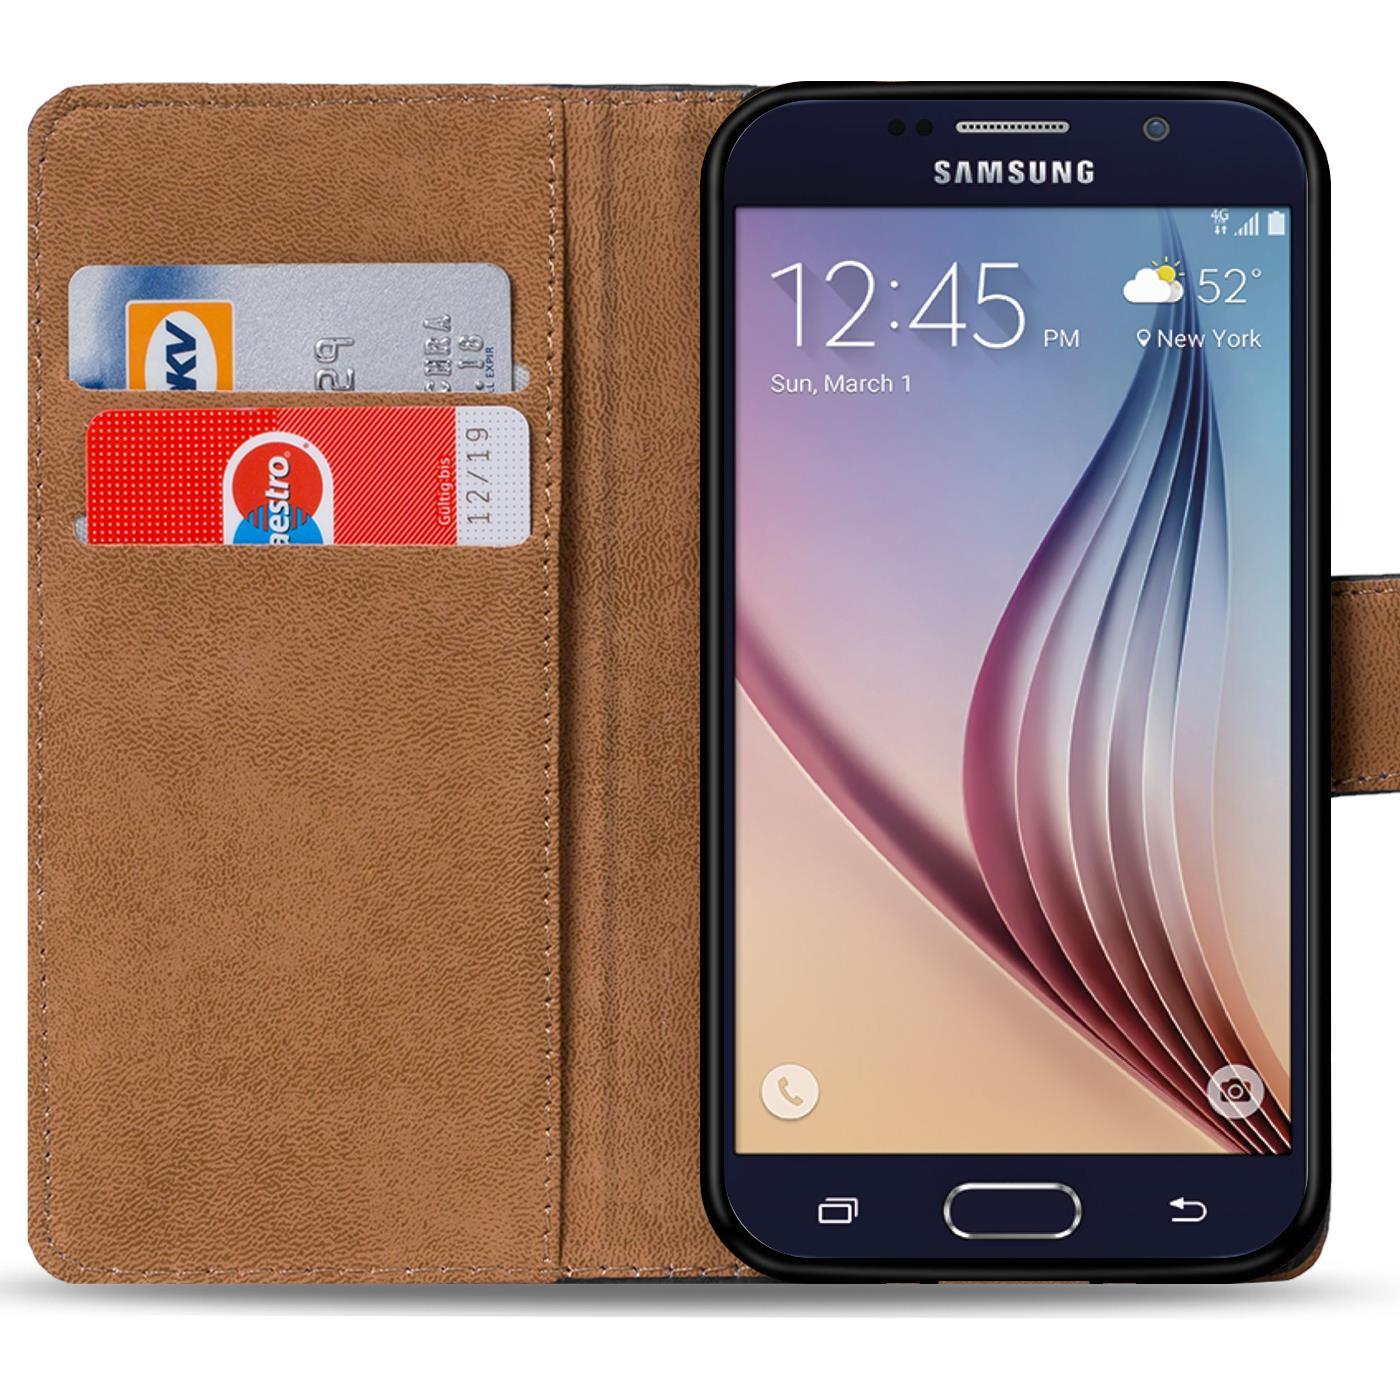 Book-Case-Samsung-Galaxy-s6-edge-Plus-Sac-etui-Flip-Cover-pour-Telephone-Portable-etui-Noir miniature 2